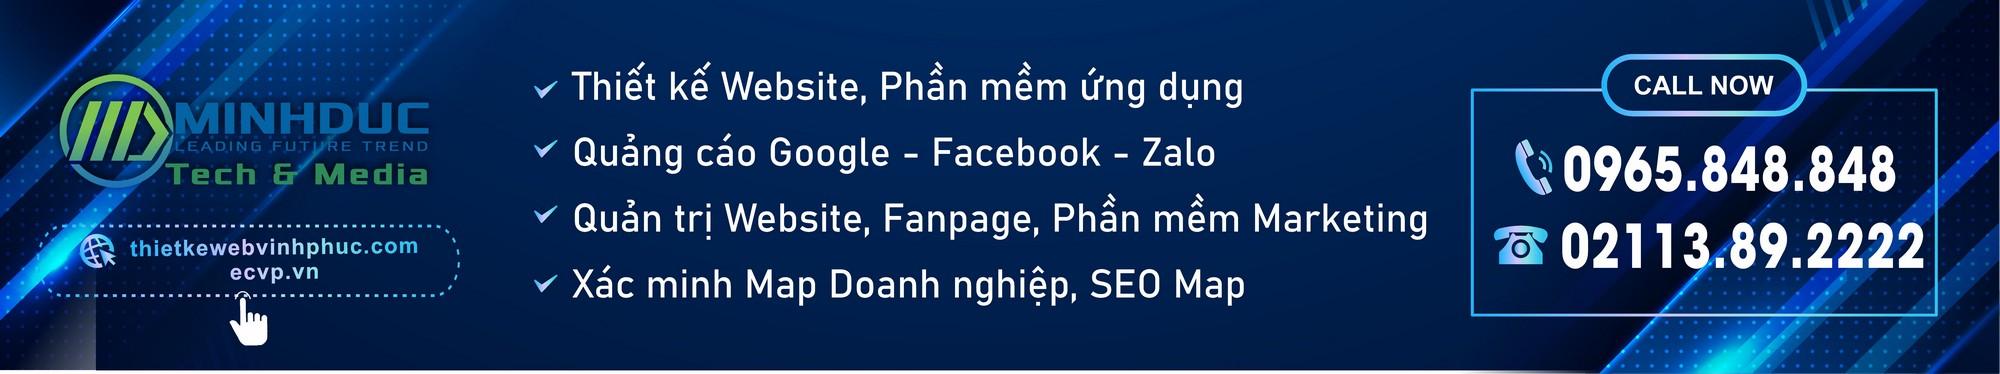 Banner Minh Duc 20 10 03